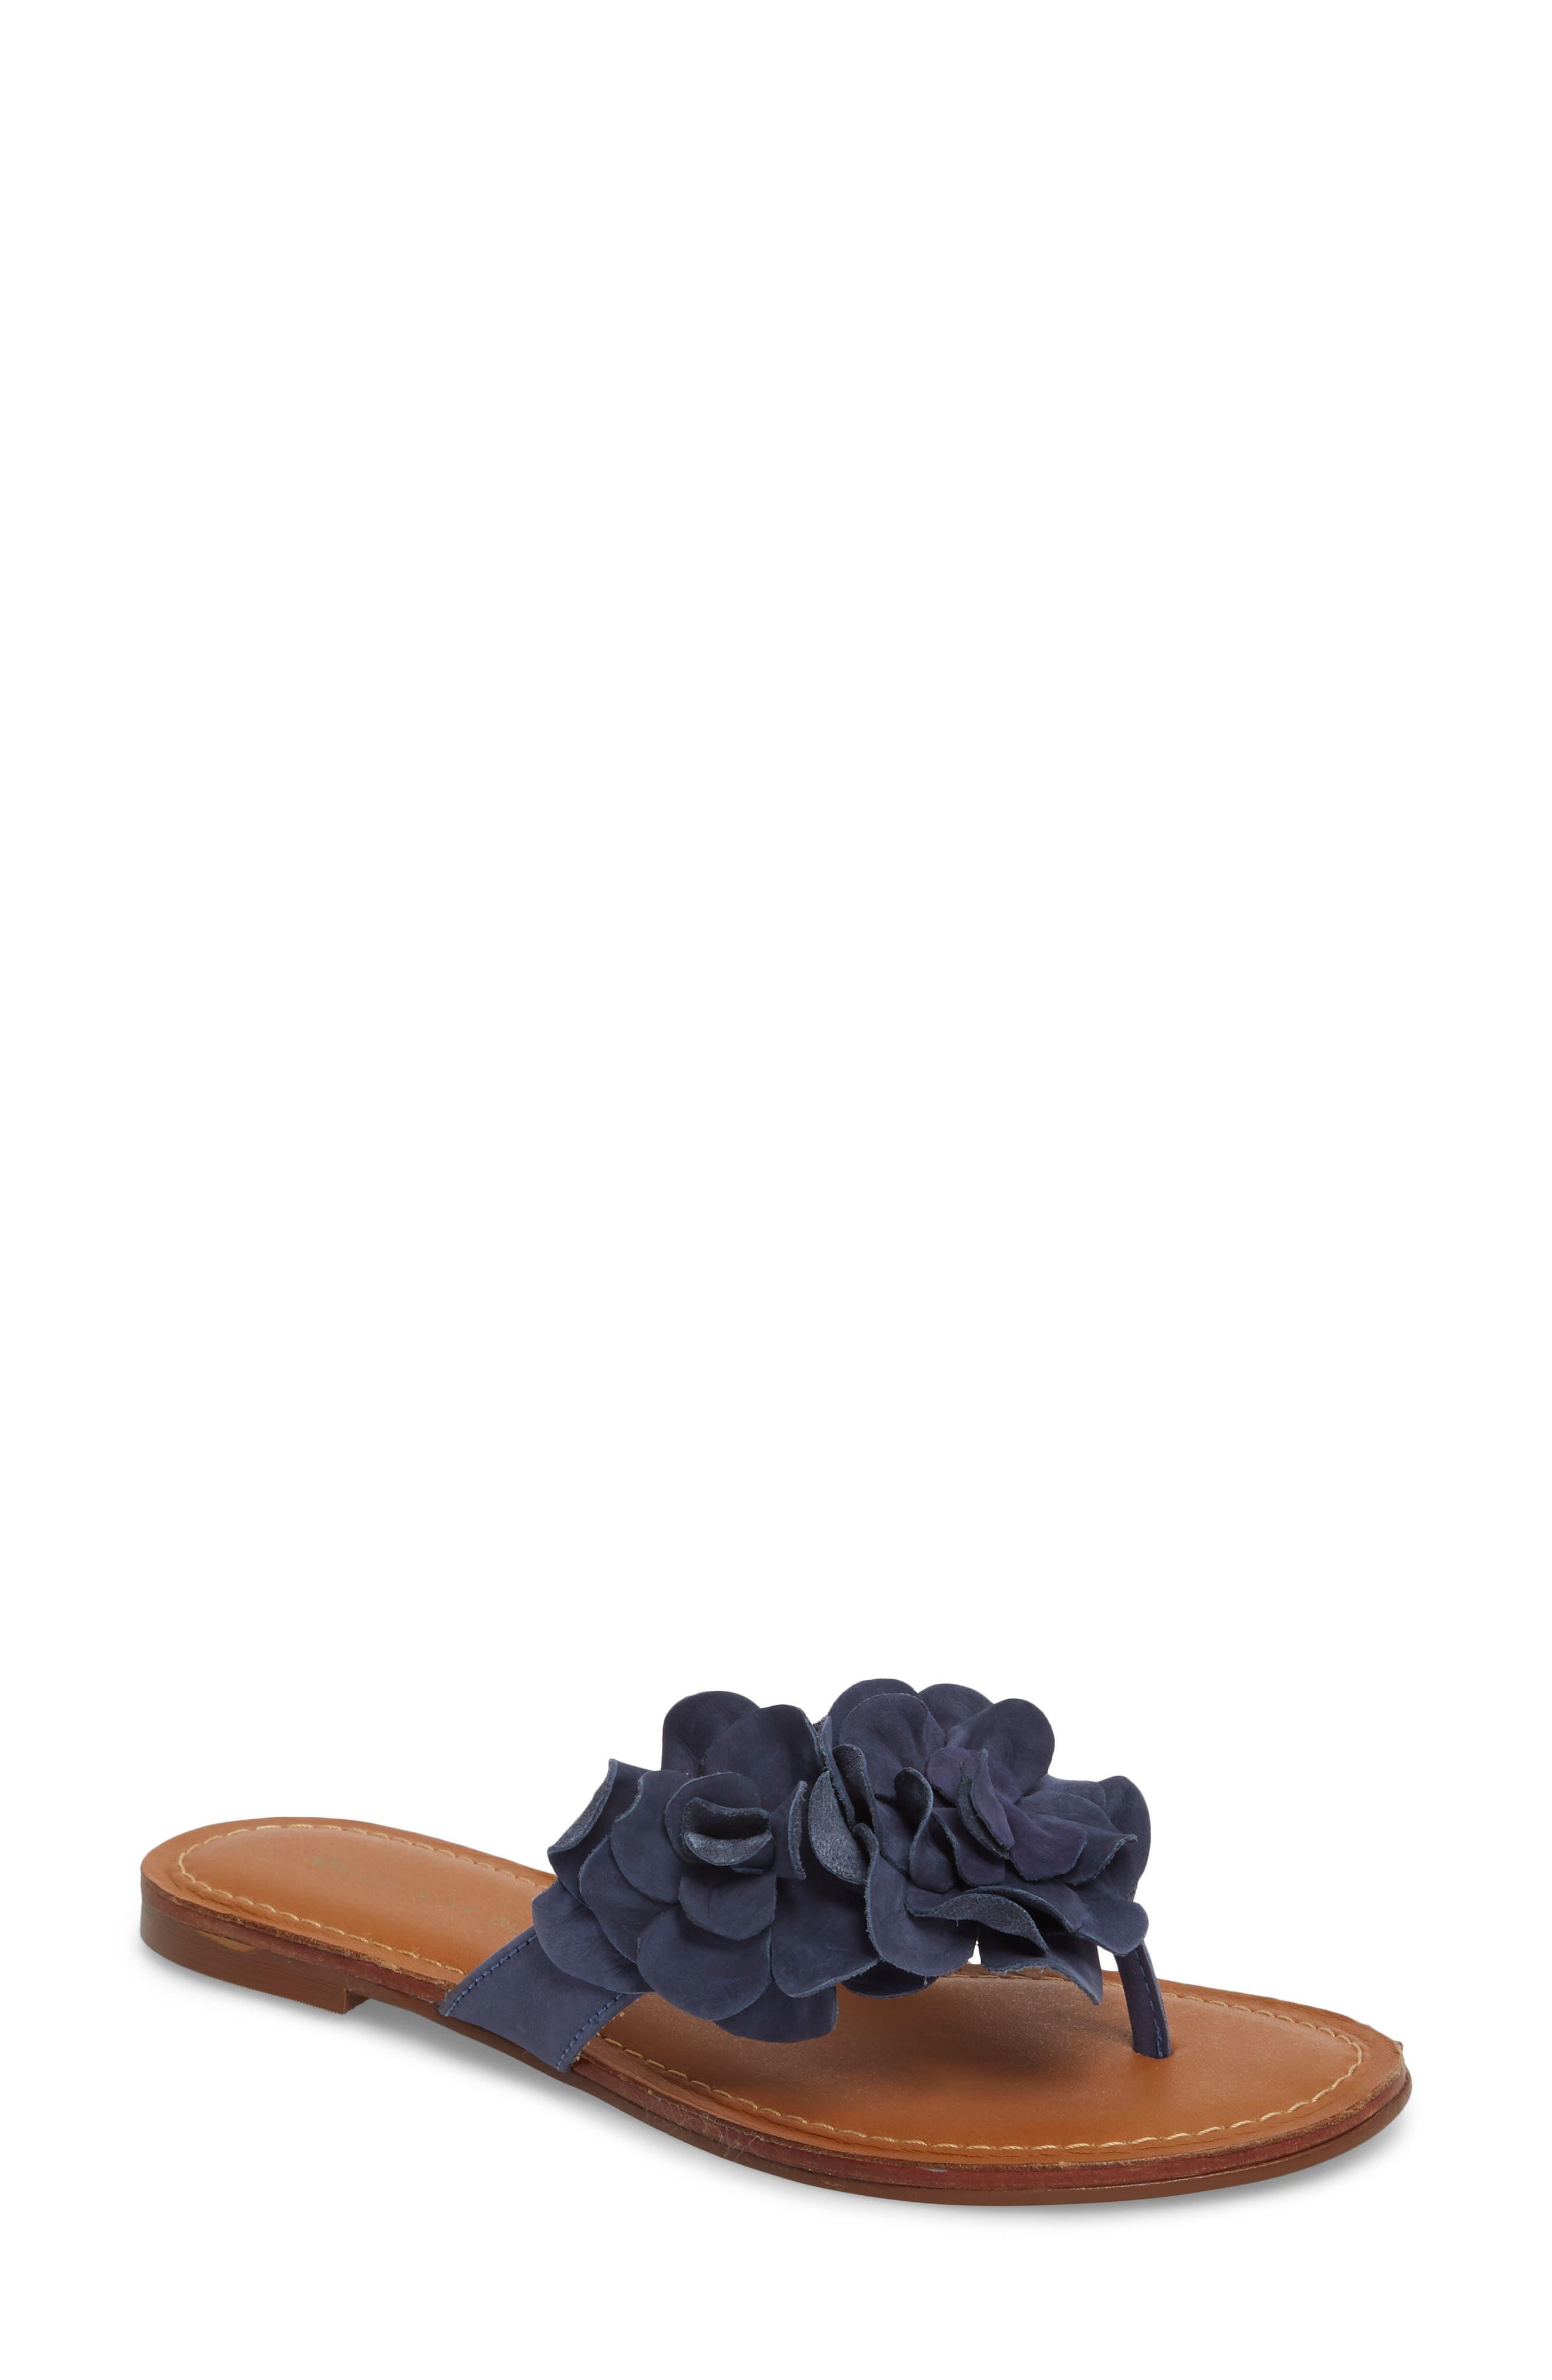 Bibi Sandal,                         Main,                         color, Navy Suede